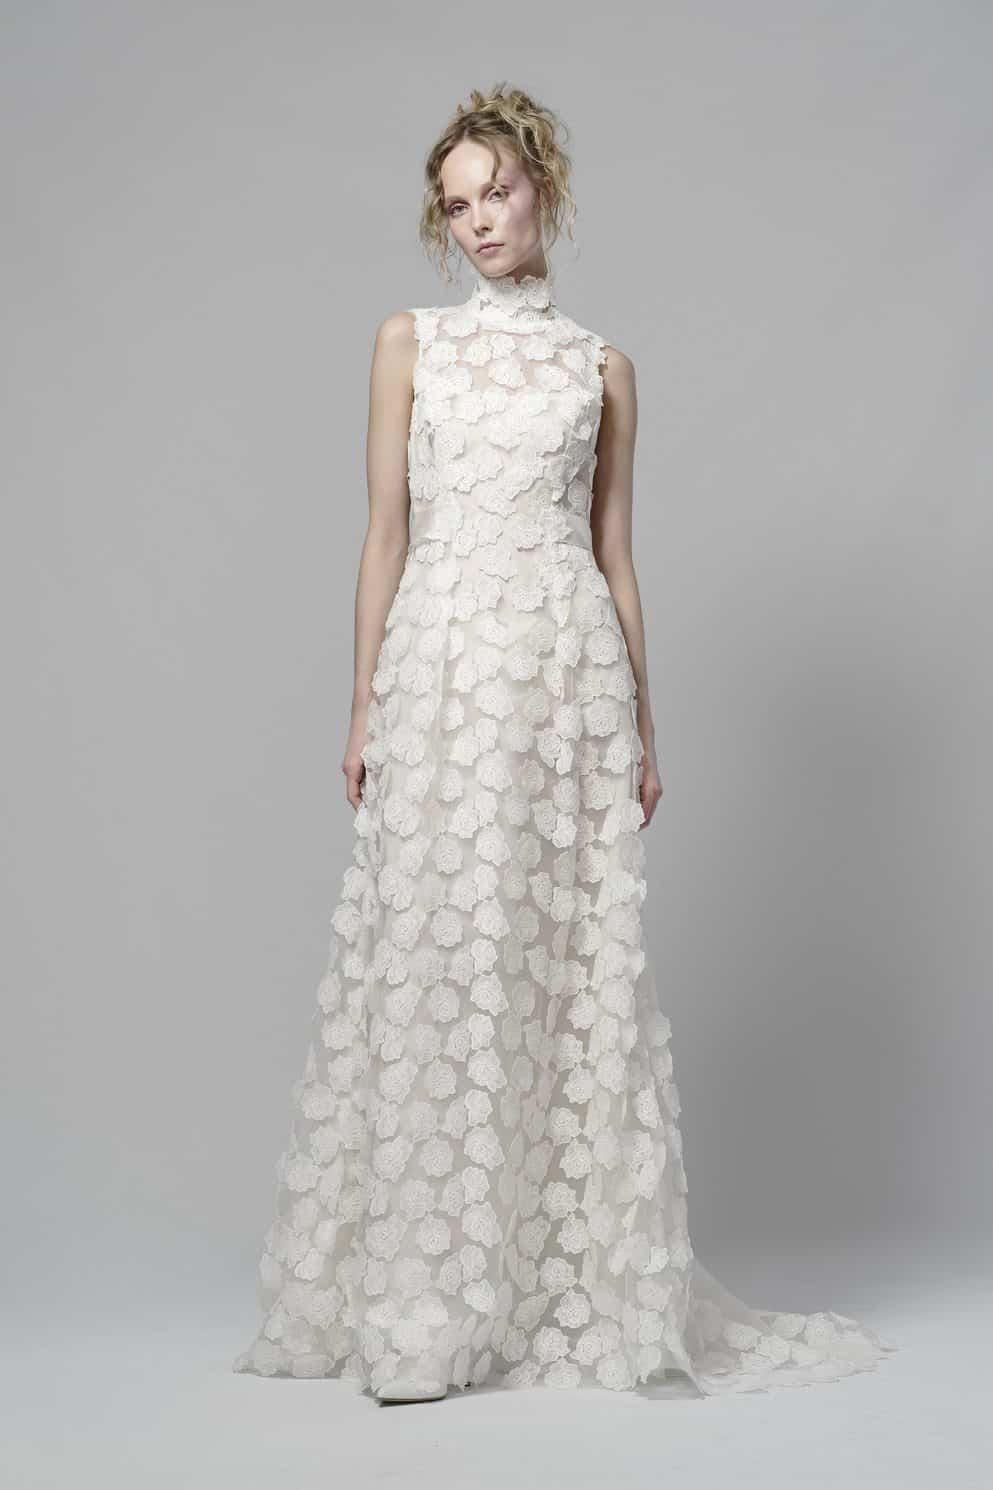 gola-alta-elizabeth-fillmore-wedding-dresses-spring-2019-006